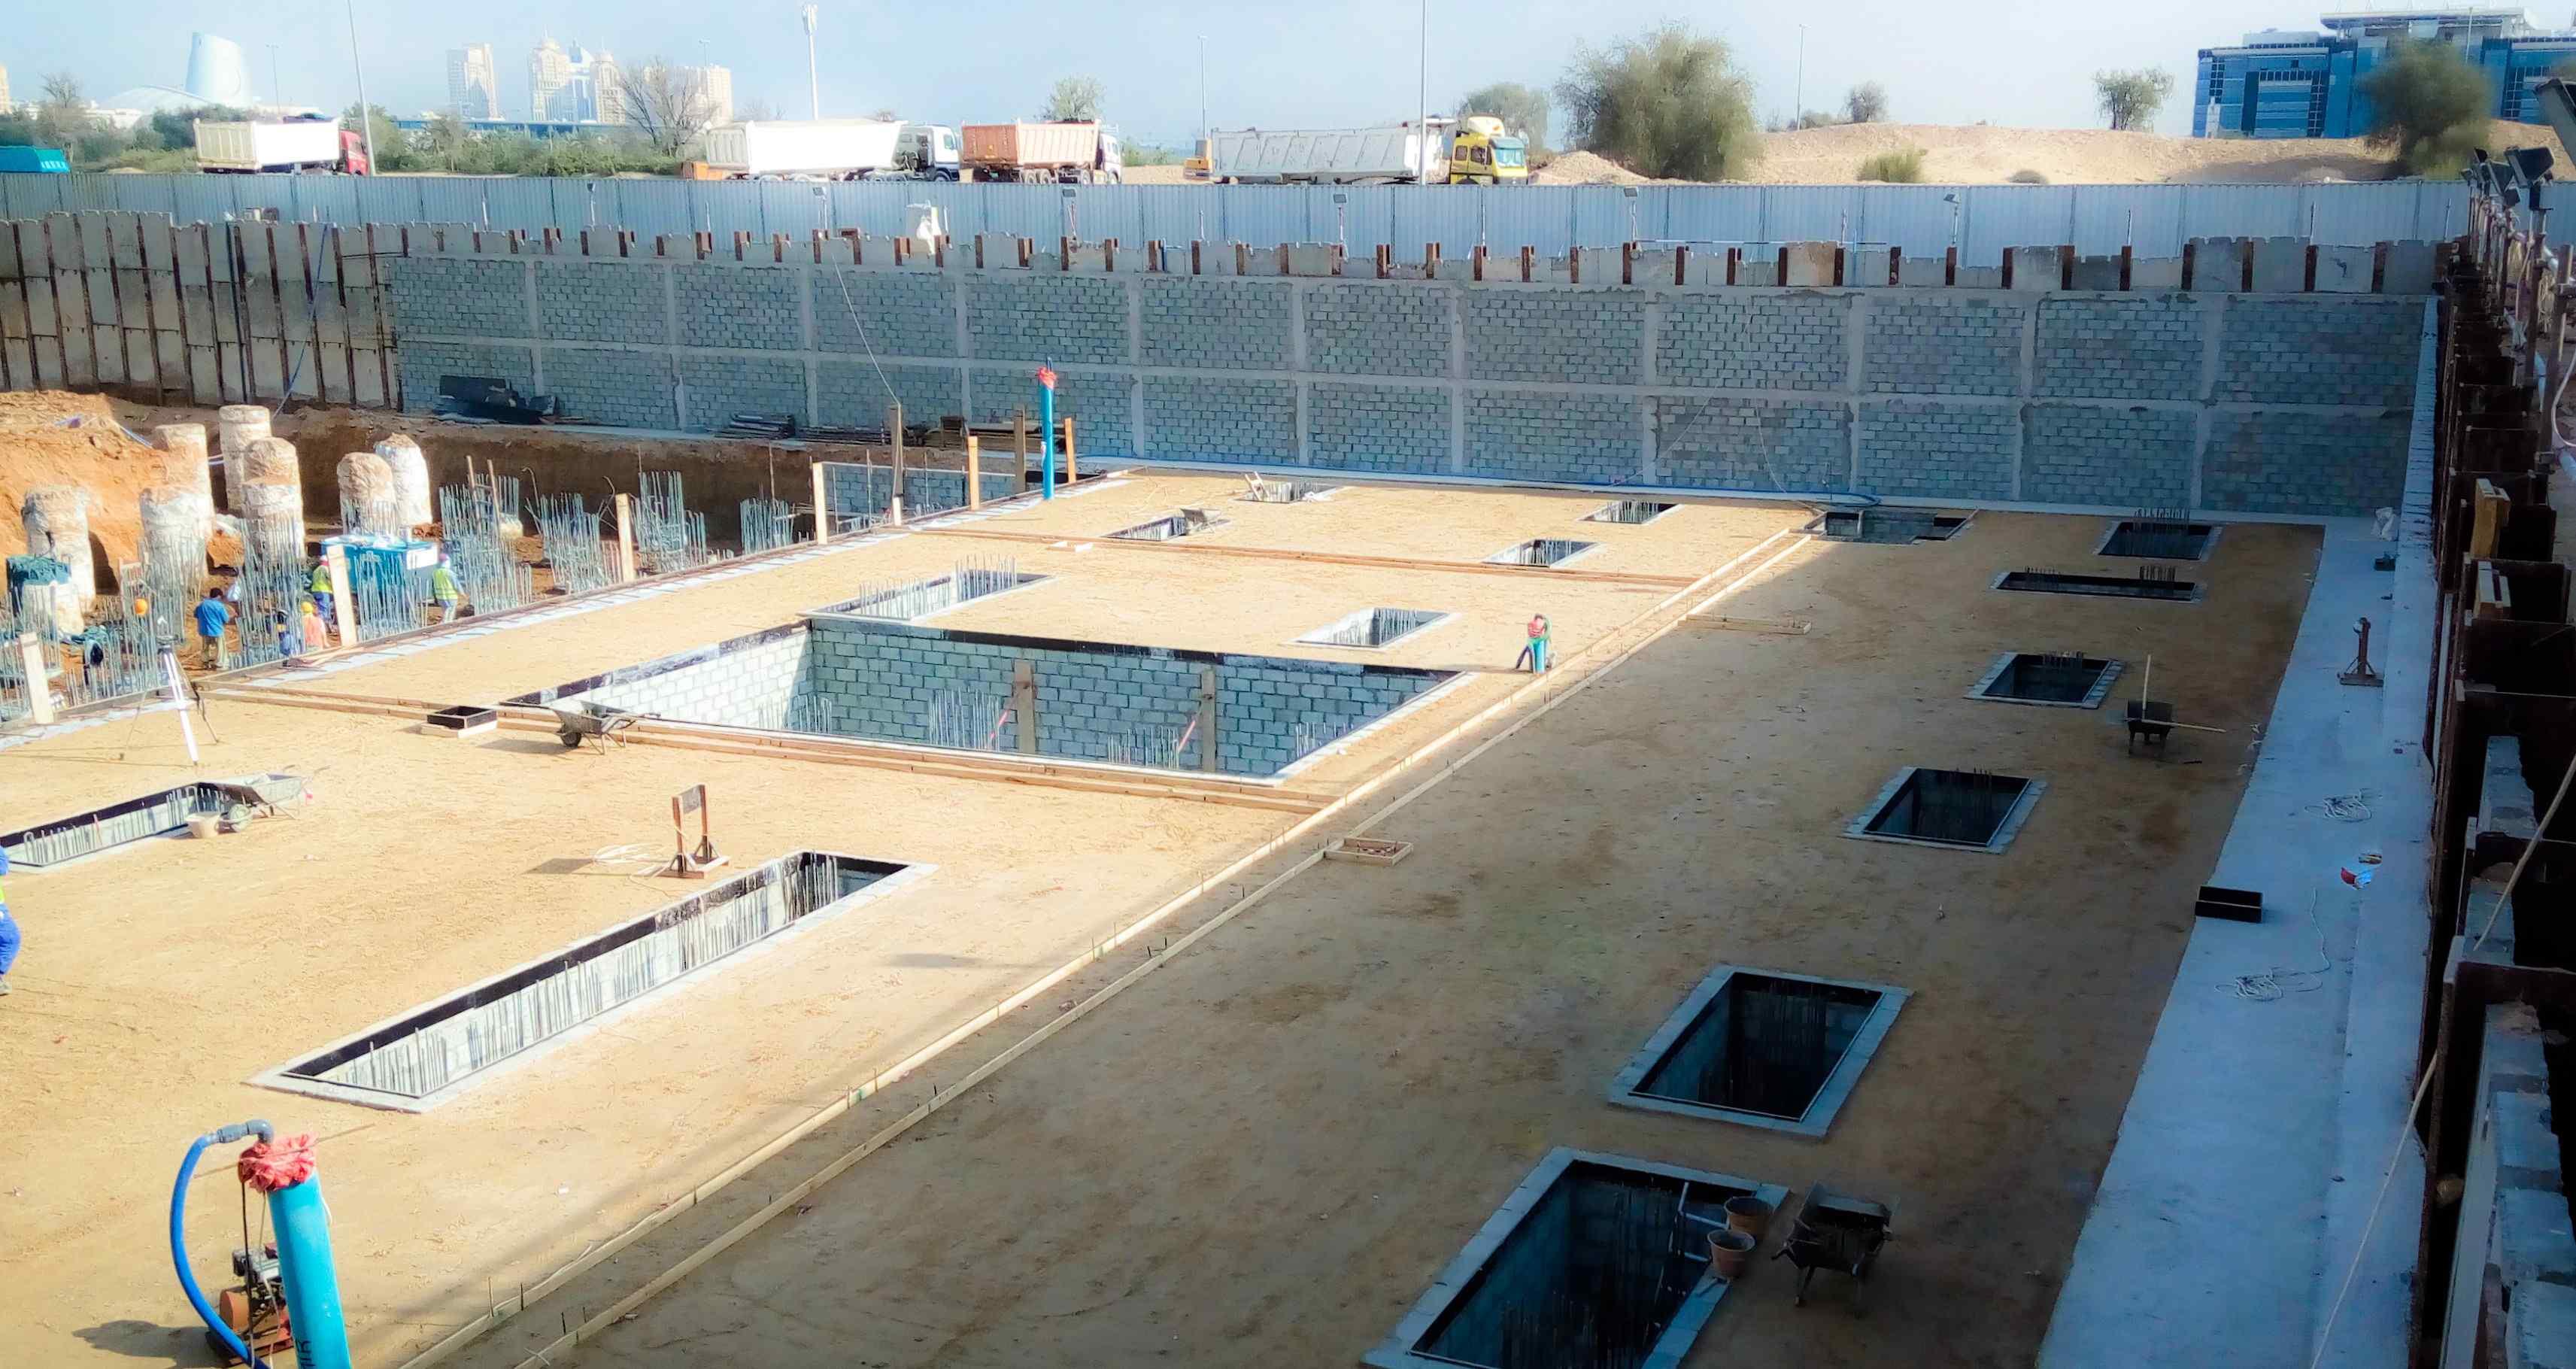 Dwex Dewatering | Deep Well Dewatering | Dewatering For Companies in UAE, Dubai, AbuDhabi, Fujairah